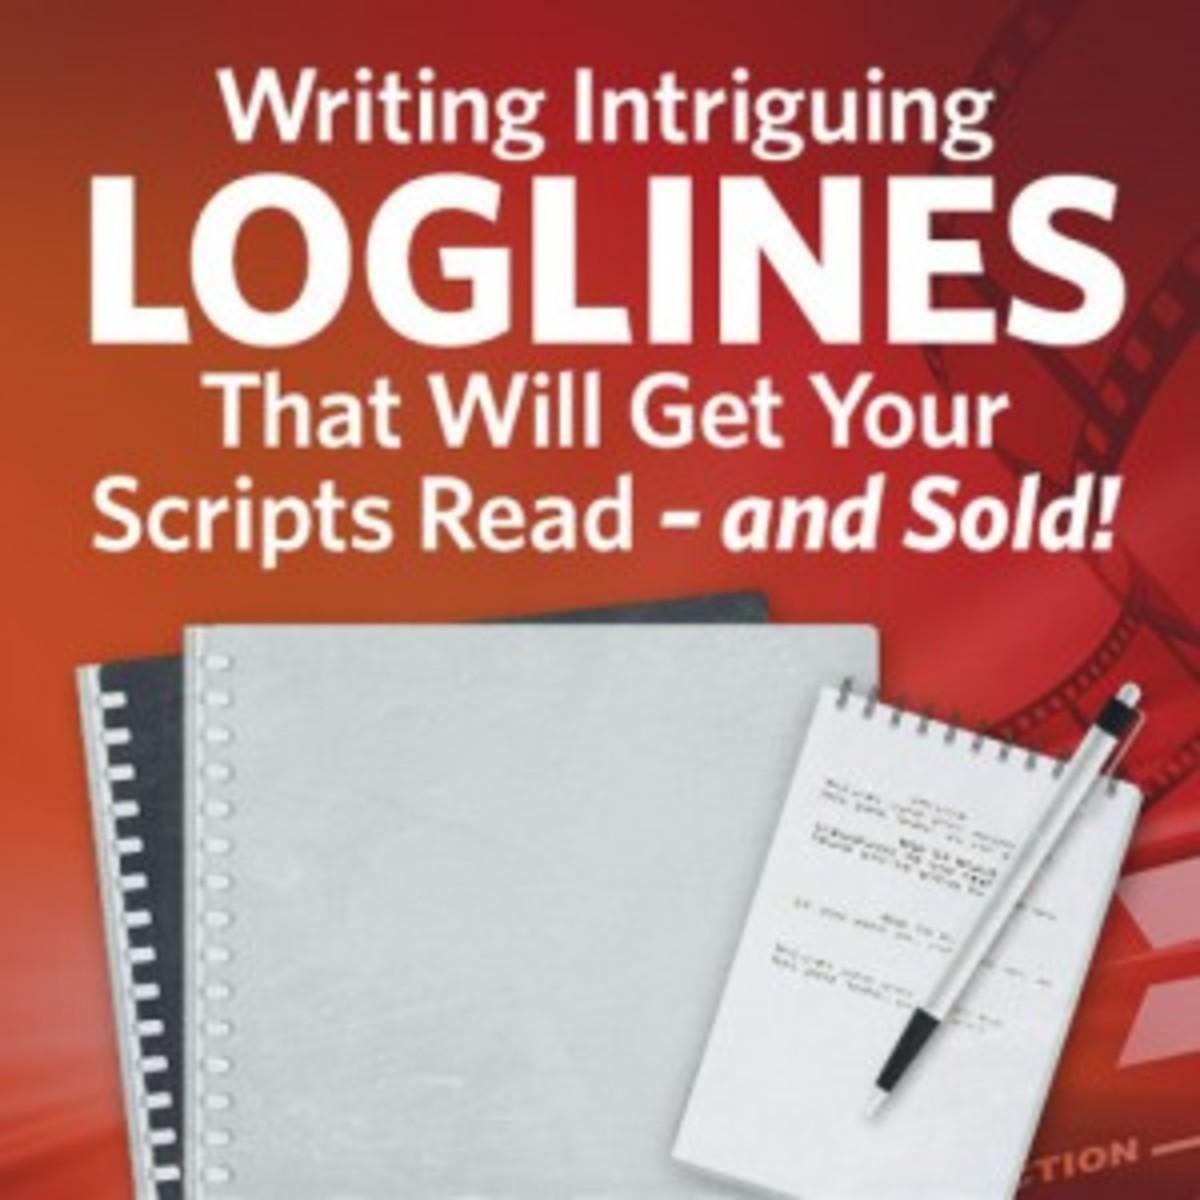 ws_loglinesscriptssold-500_medium